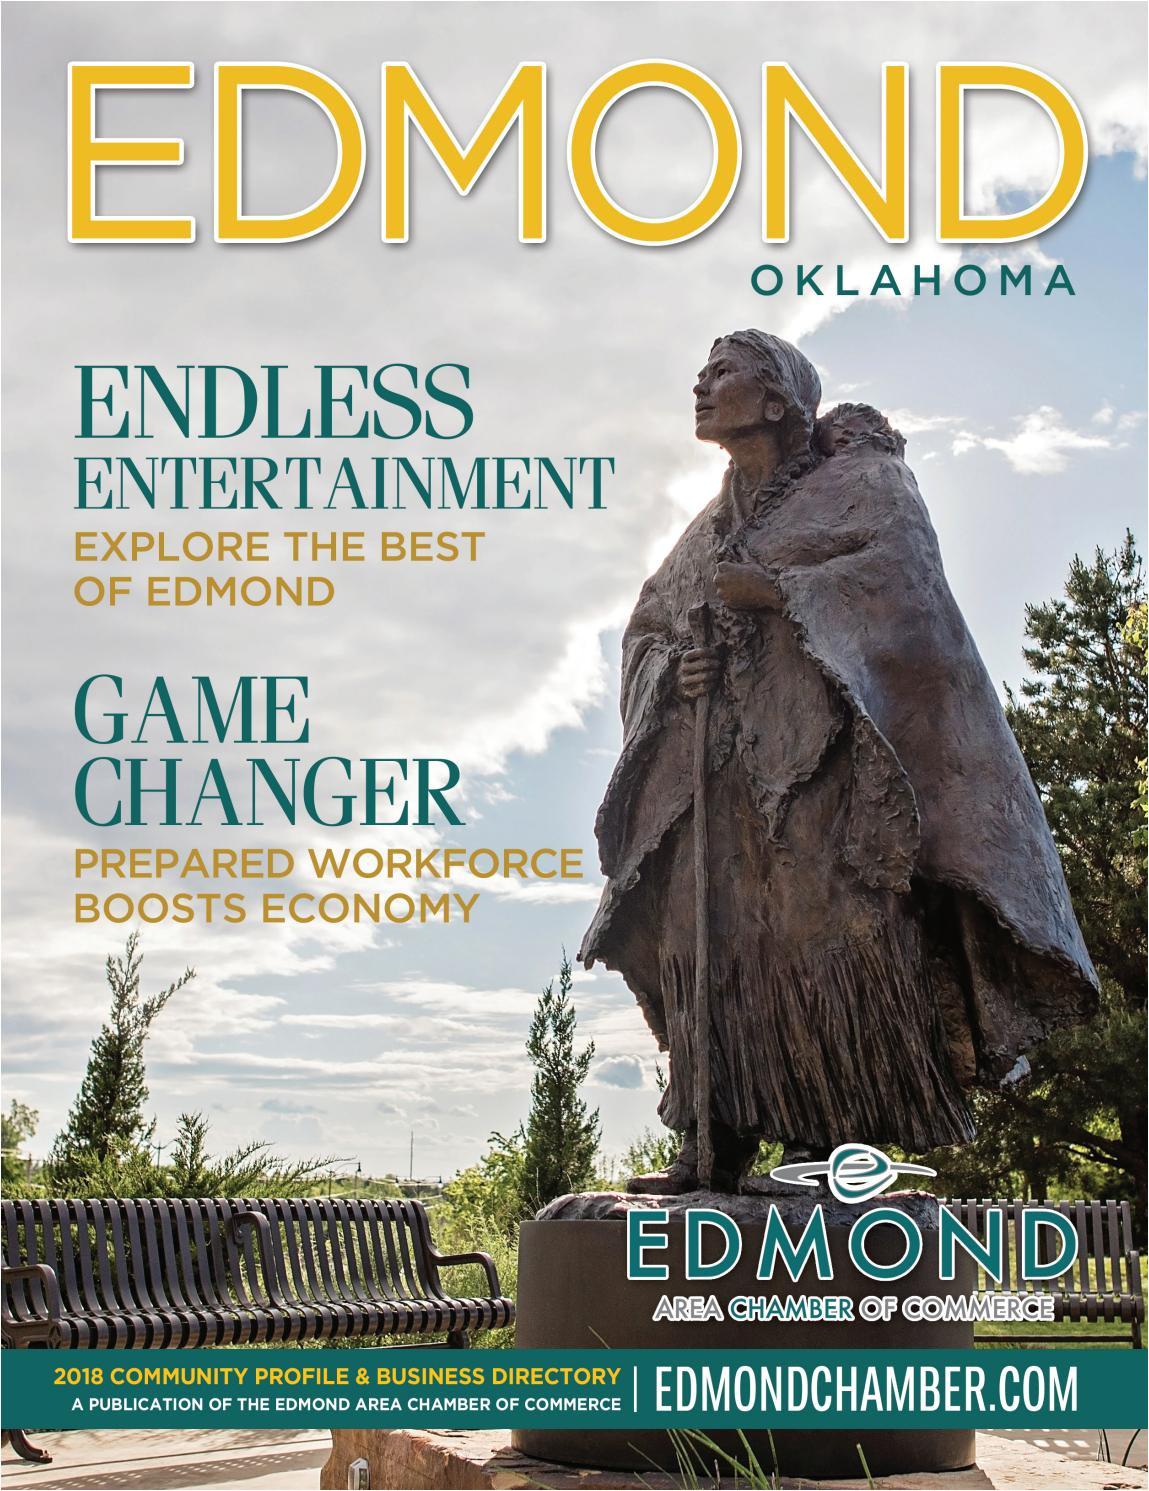 Public Storage Edmond Ok 73013 Edmond Ok Community Profile and Business Directory by town Square